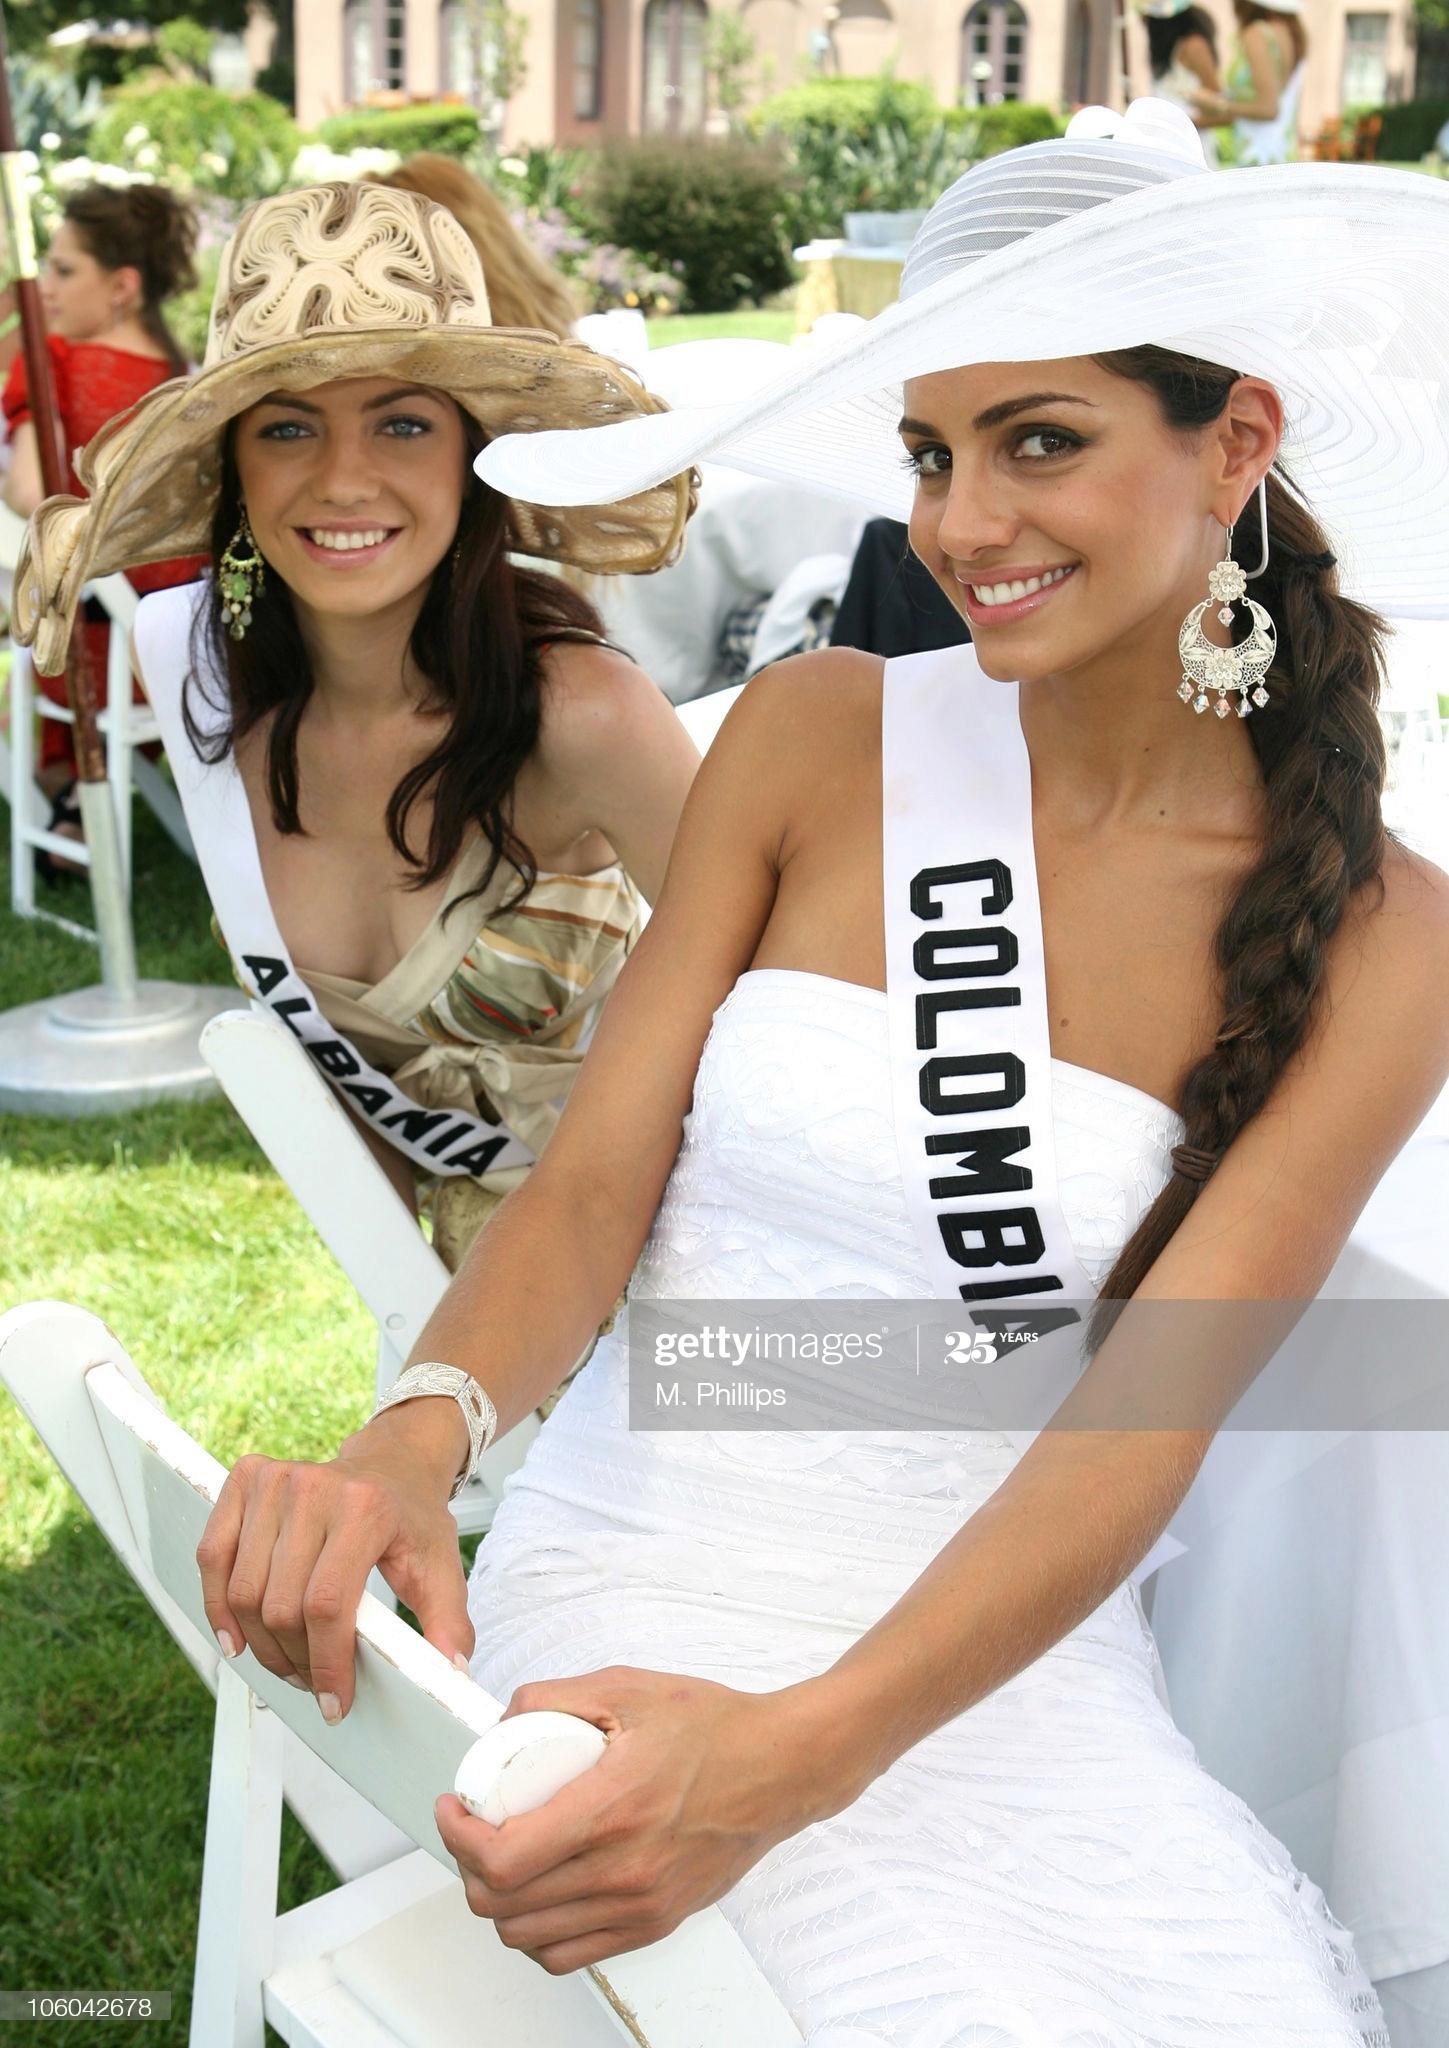 valerie dominguez, top 10 de miss universe 2006. - Página 3 Eralga10